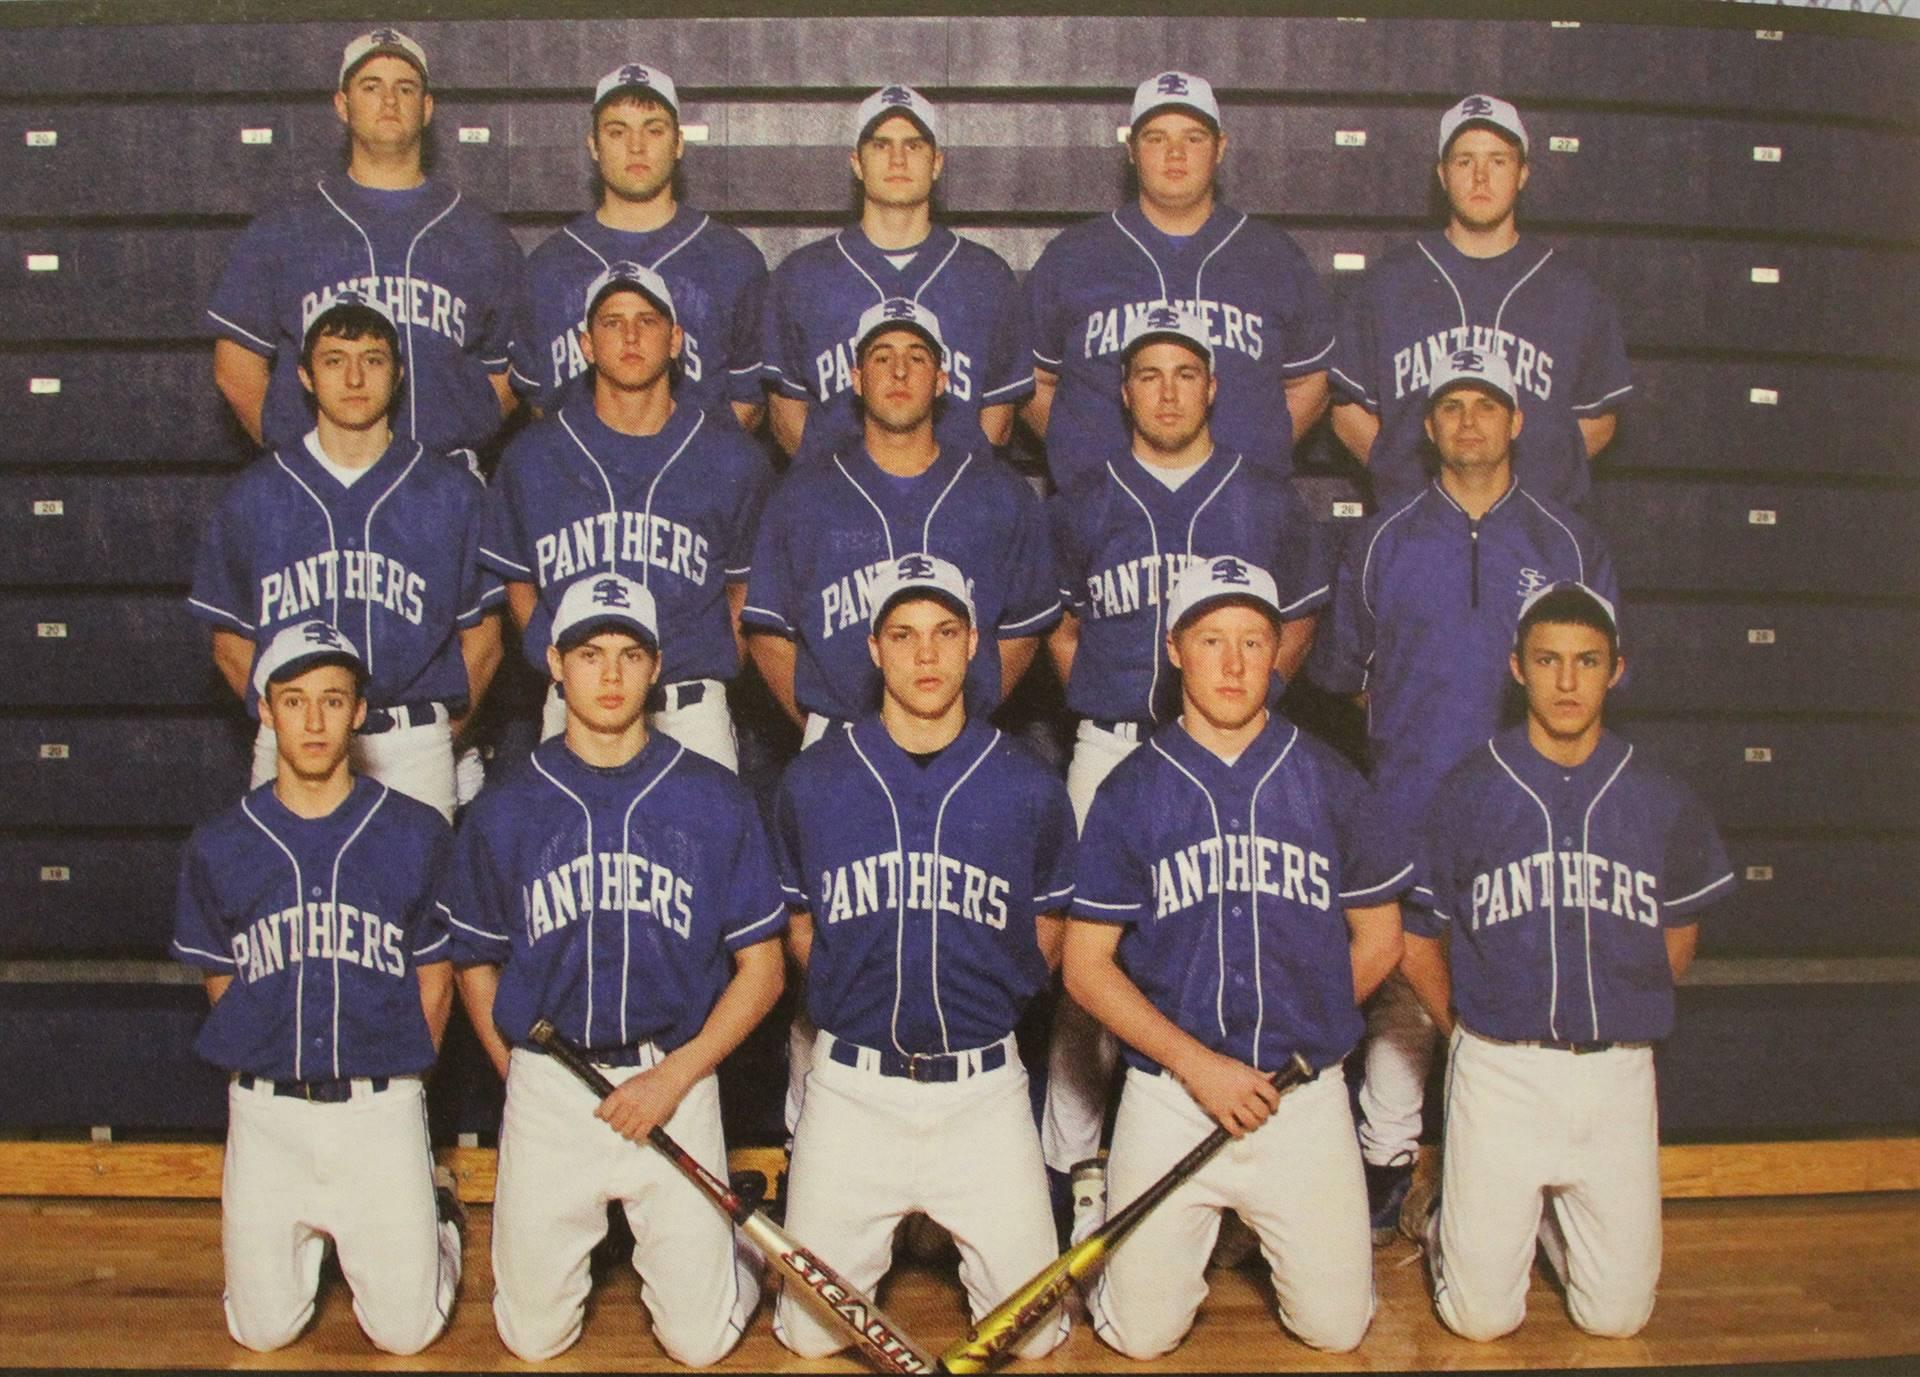 2008 baseball